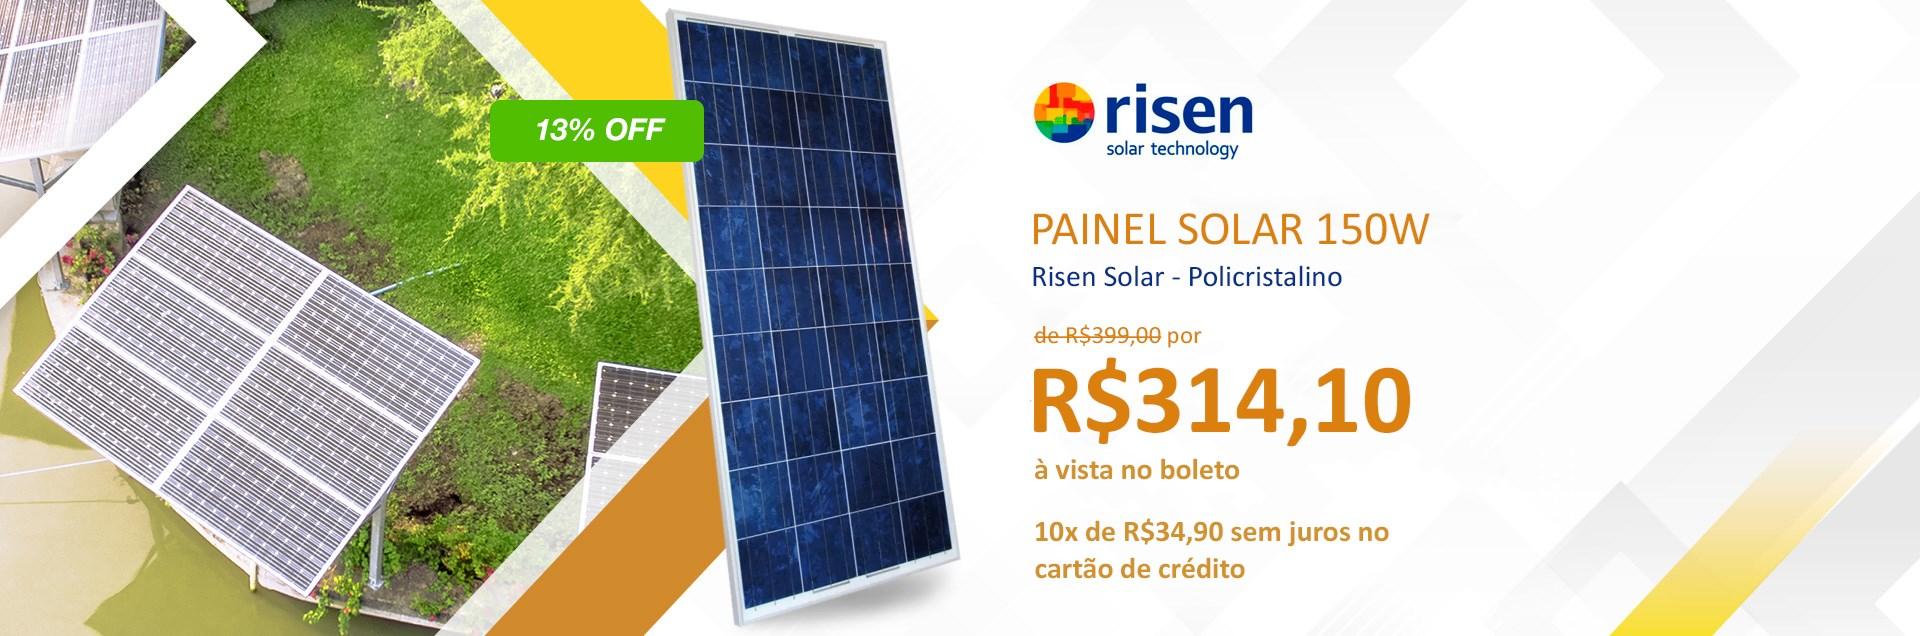 Painel Solar 150W Risen Solar - Policristalino - Dezembro